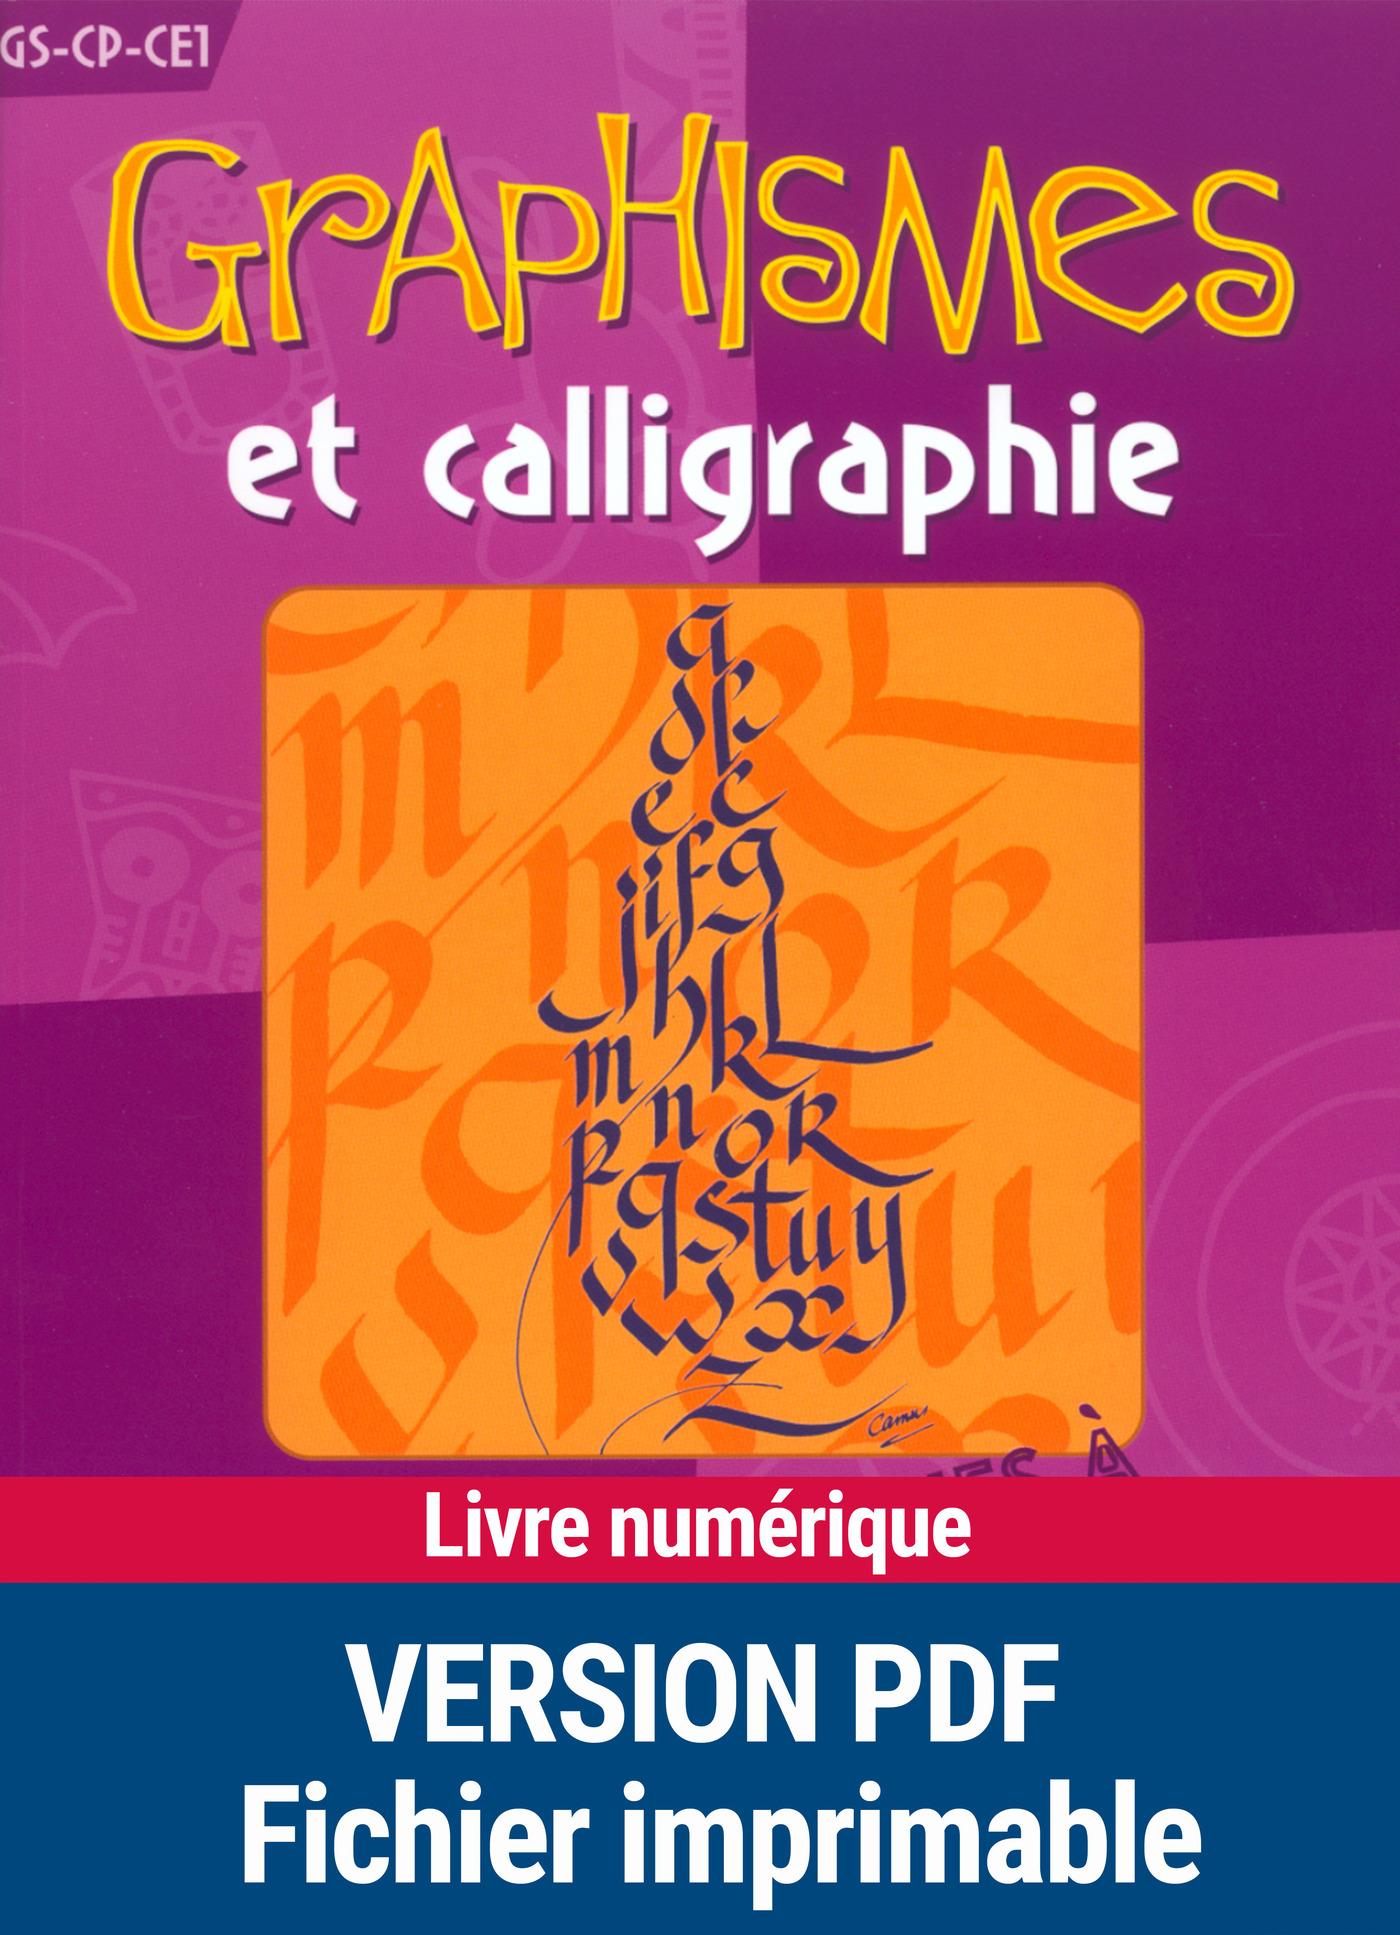 Graphismes et calligraphie (ebook)